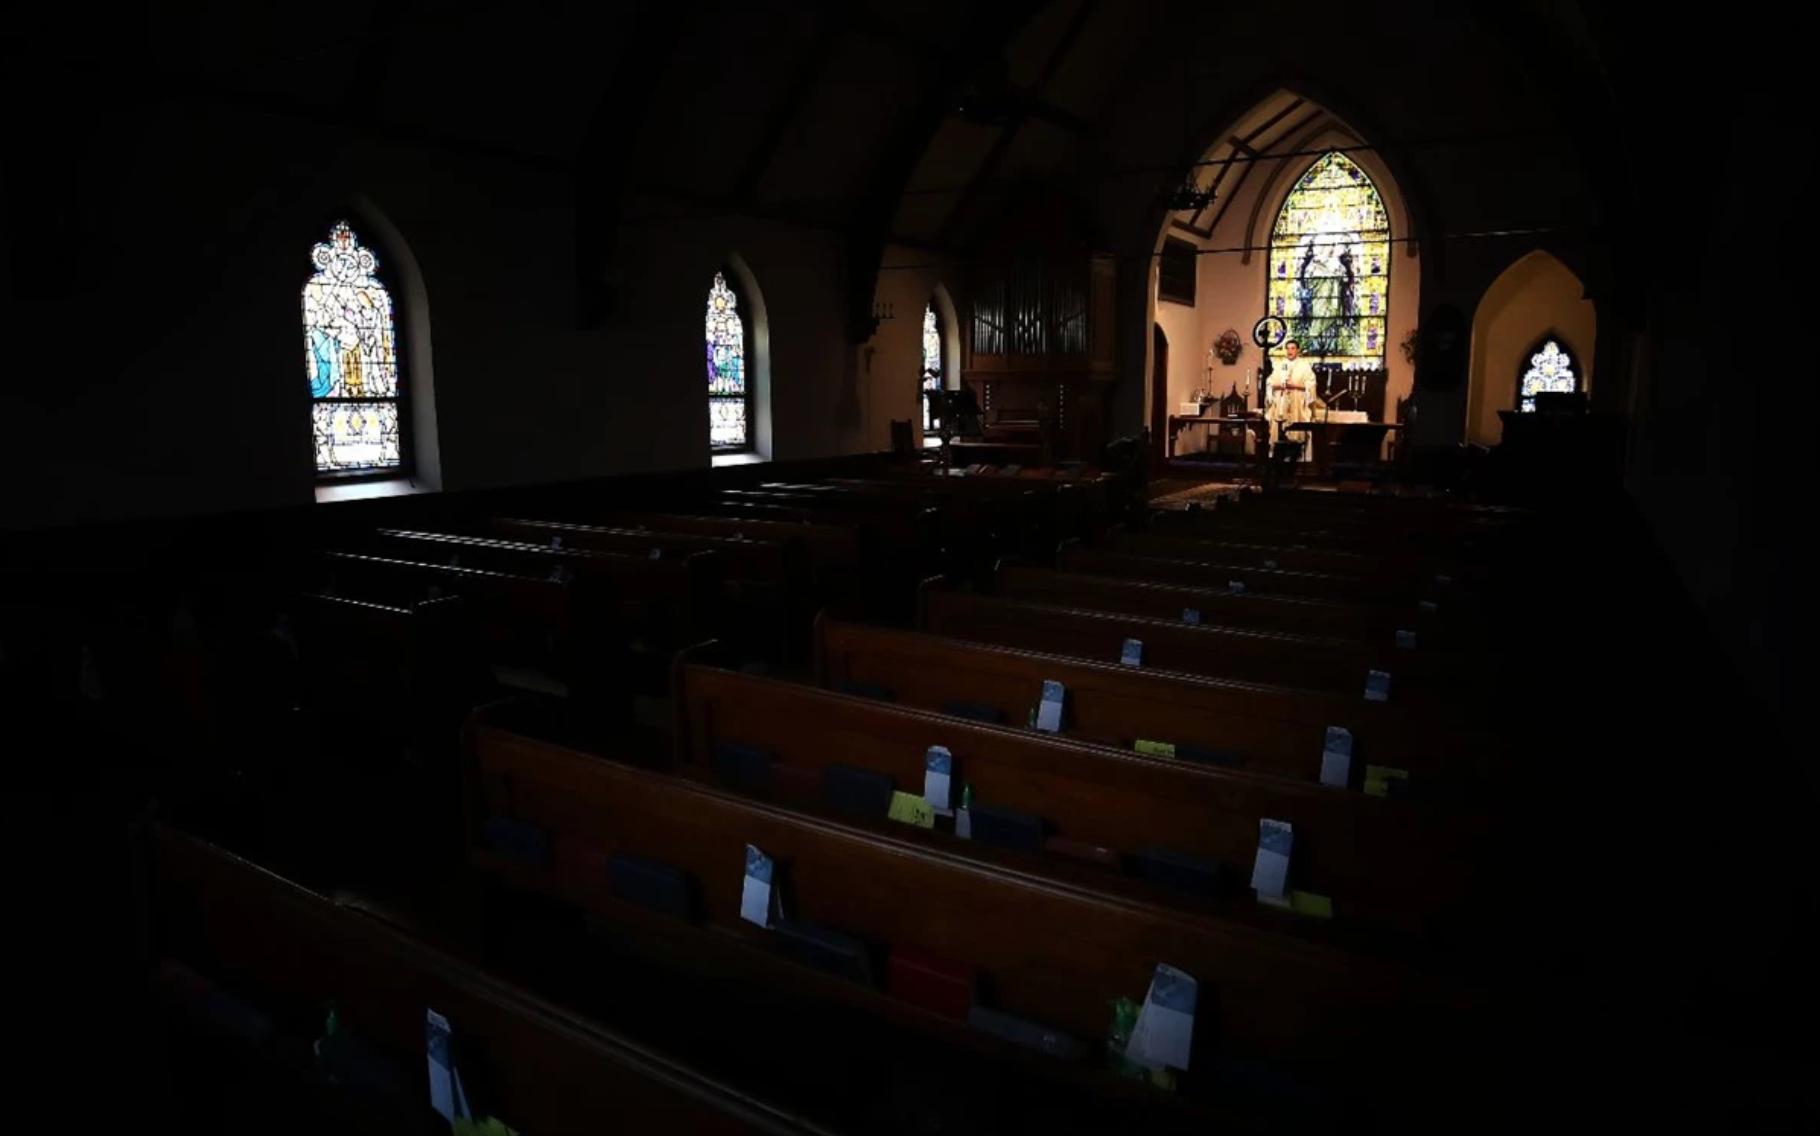 Burge - Mainline & Evangelical demography